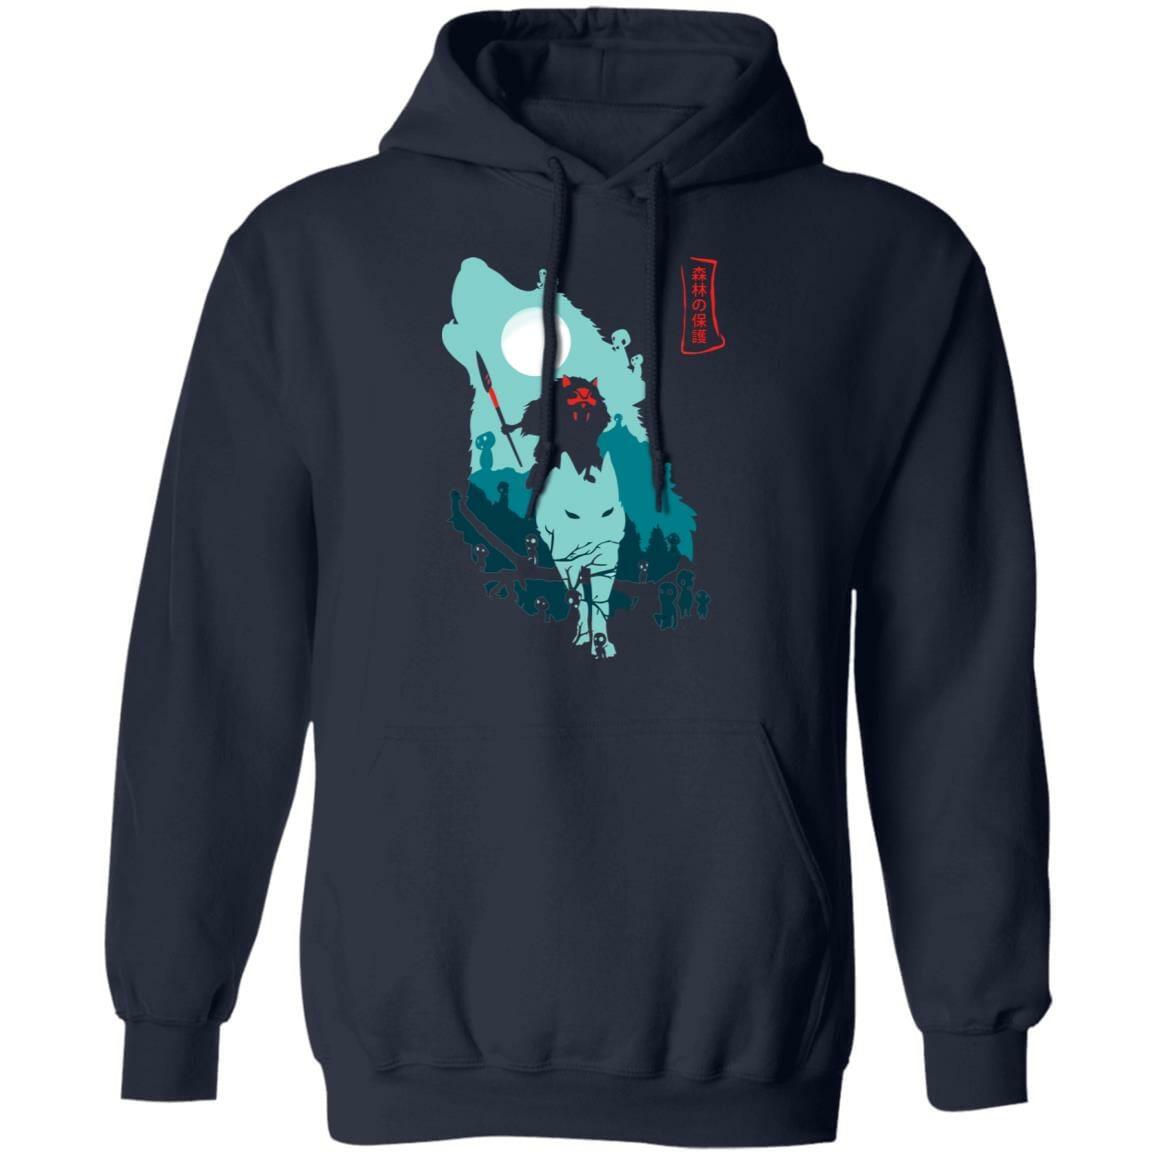 Princess Mononoke – Guardians of the Forest Hoodie Unisex